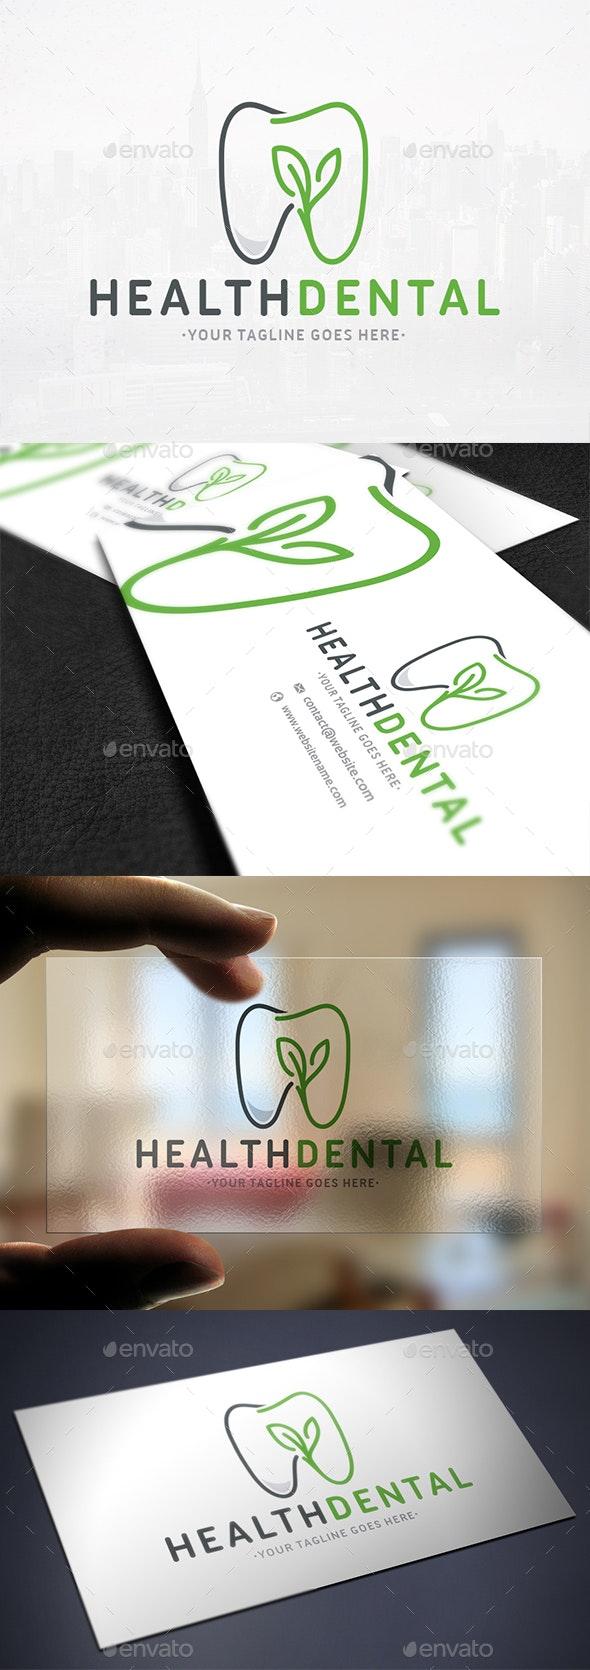 Dental Health Logo Template - Objects Logo Templates